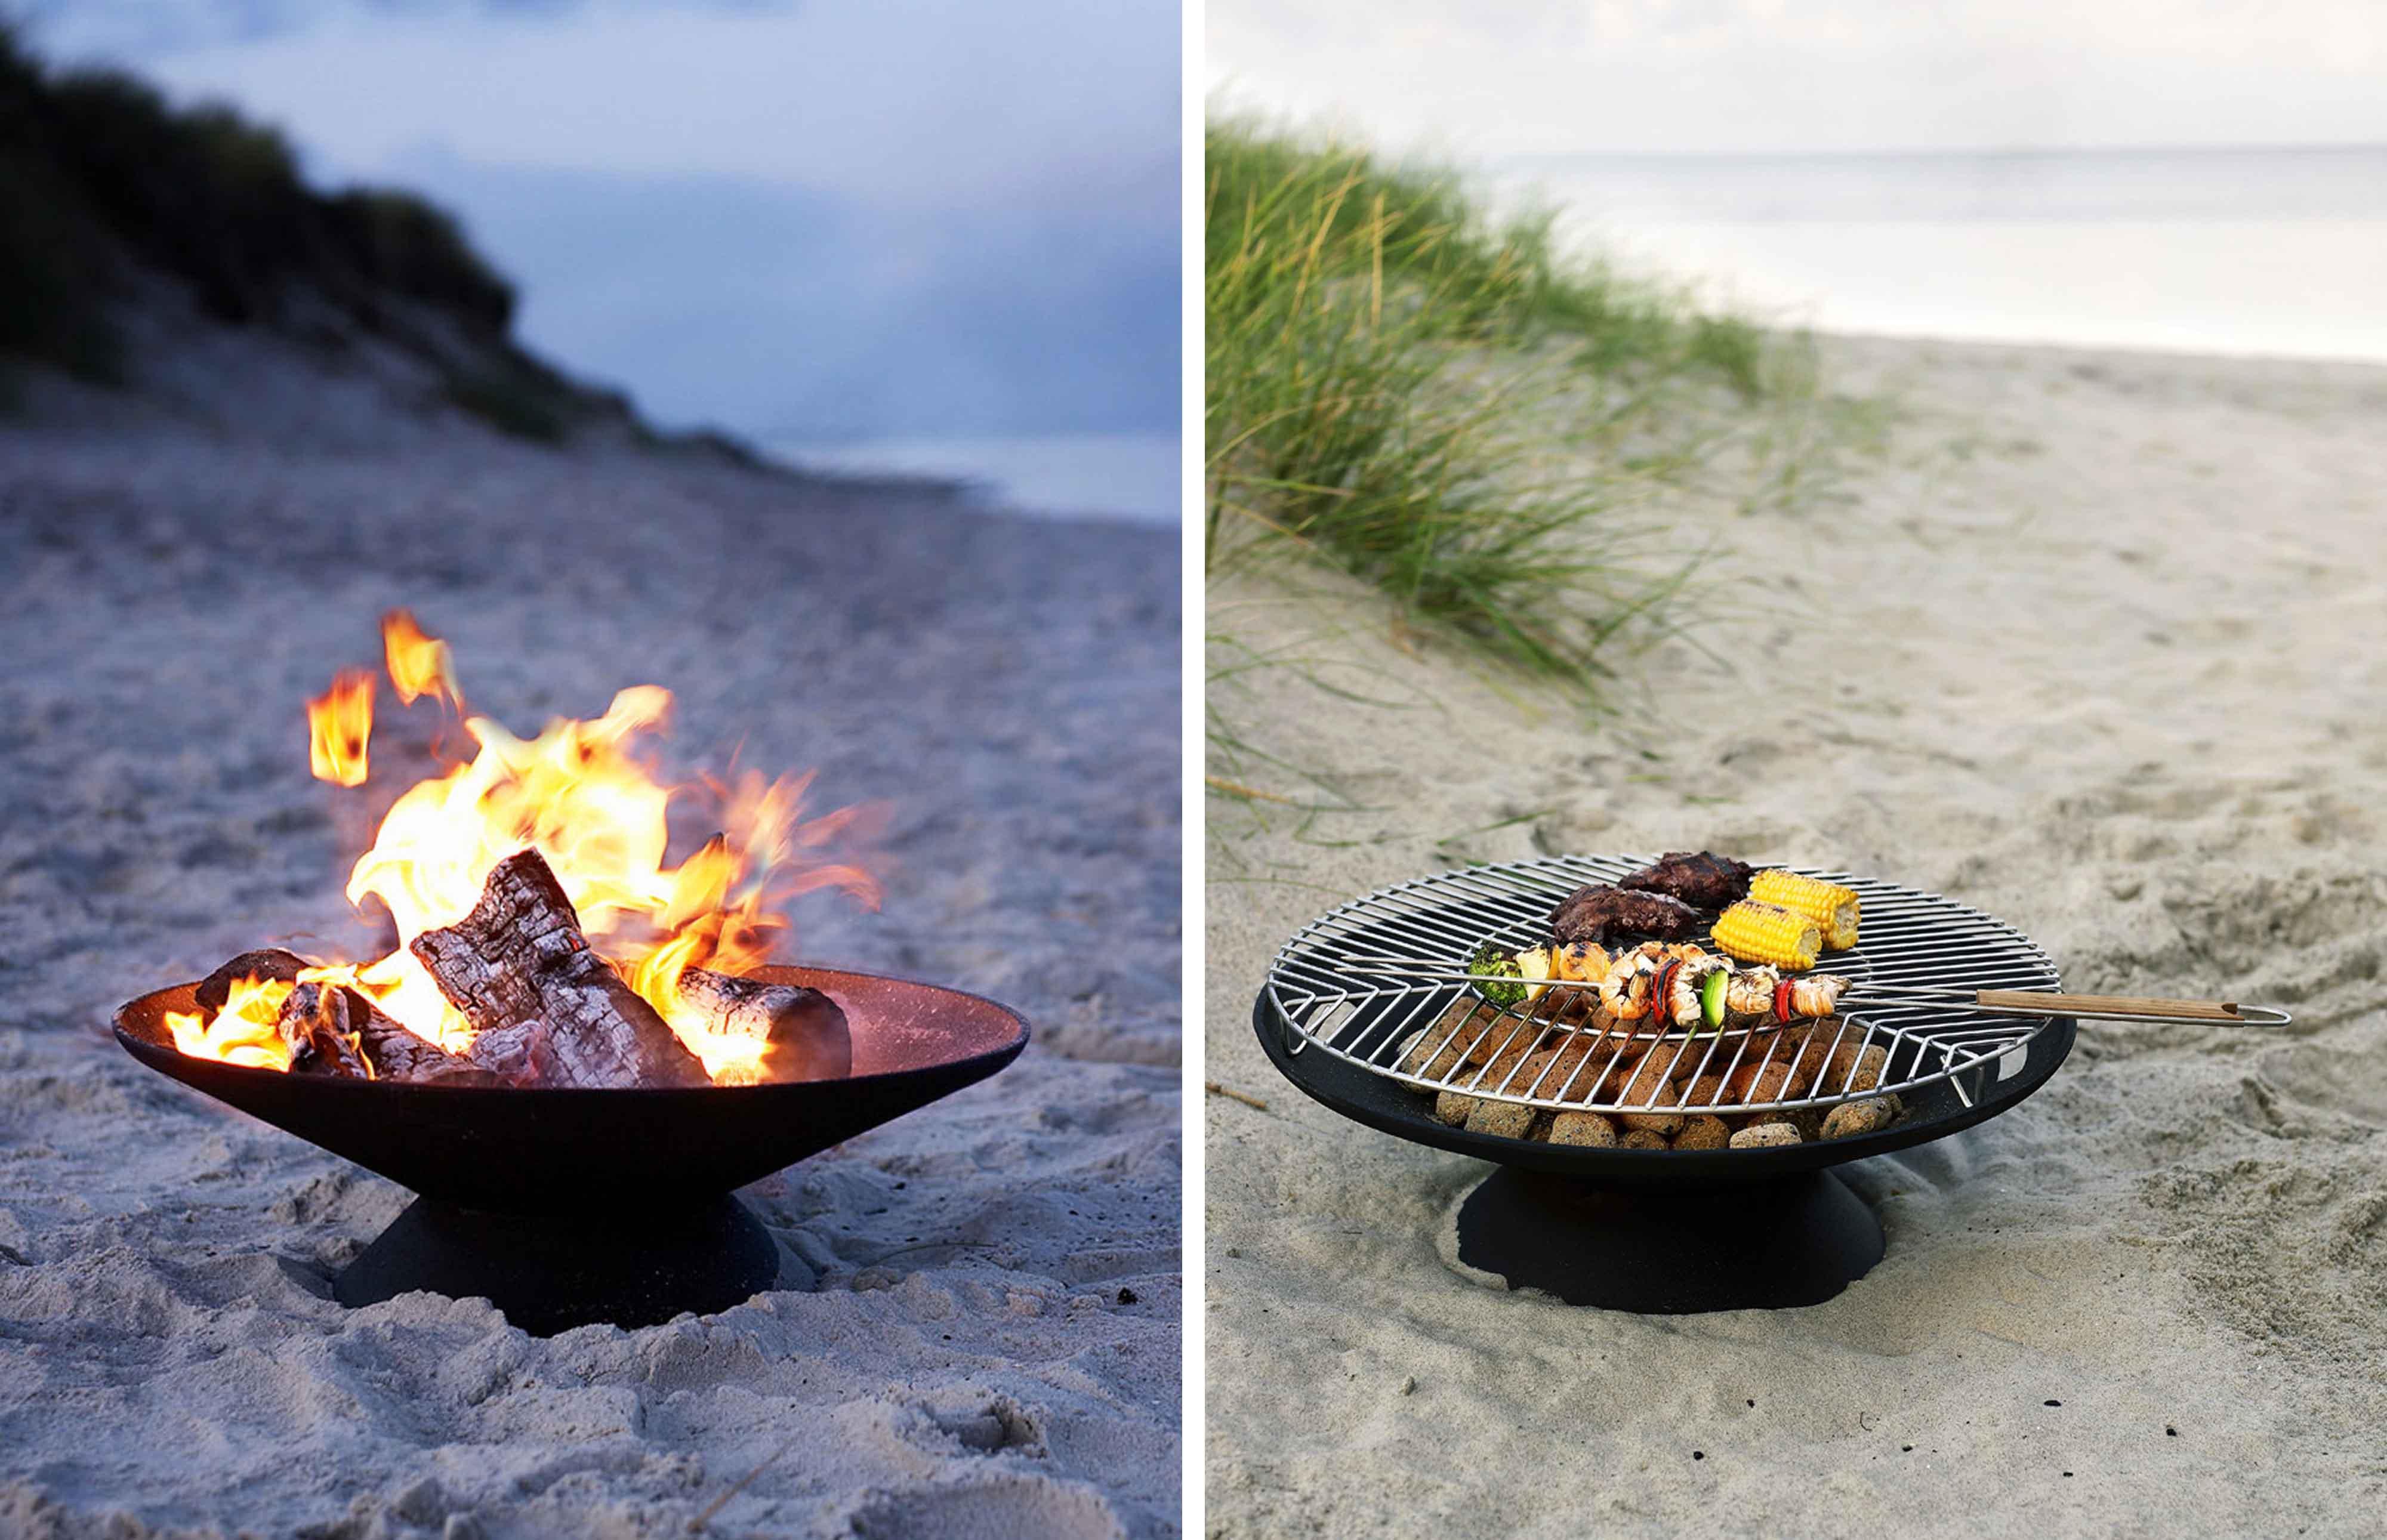 helios-firebowl-and-grill-moleta-munro